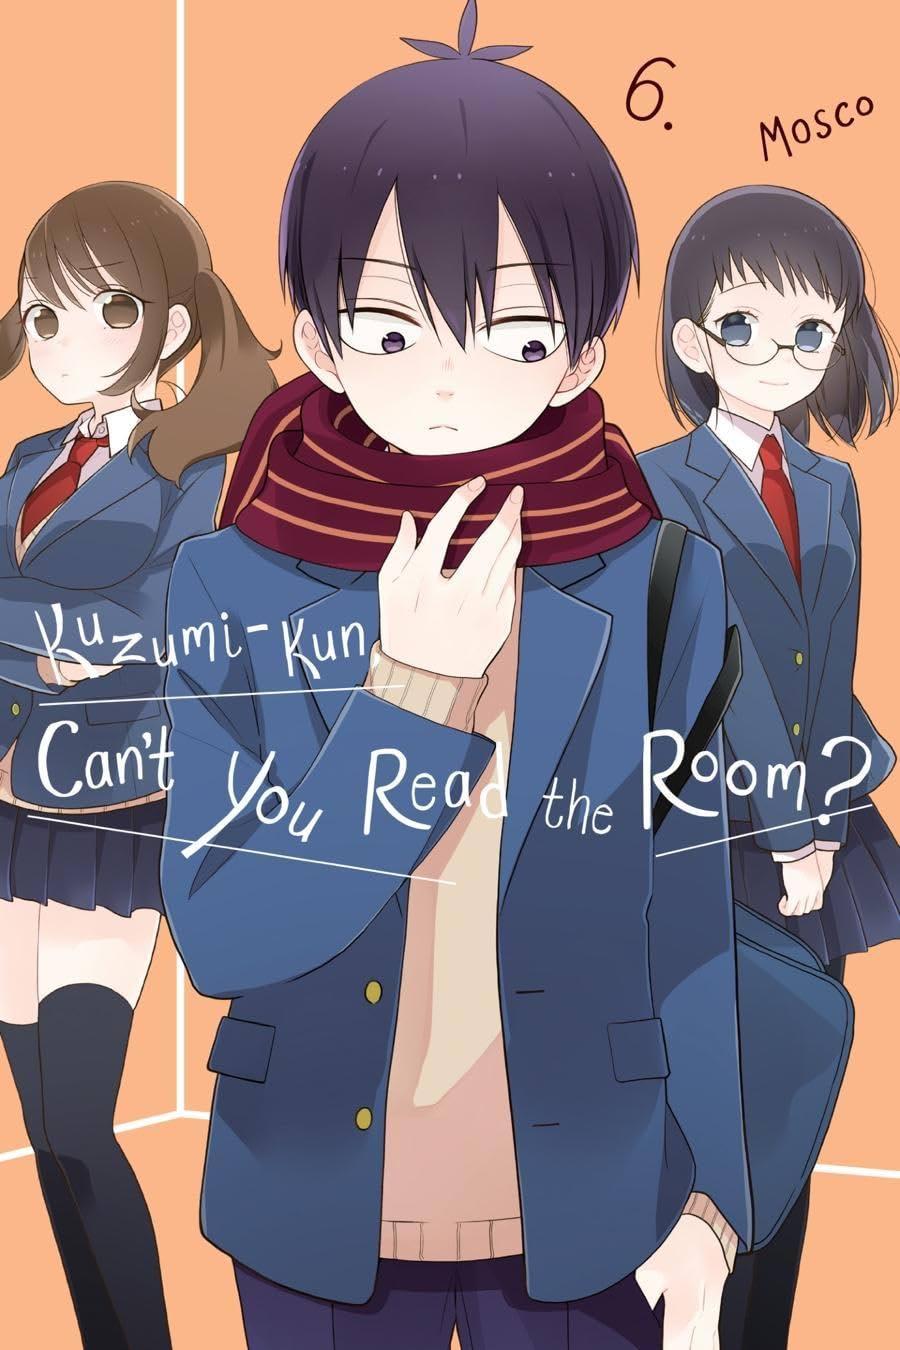 Kuzumi-kun, Can't You Read the Room? Vol. 6